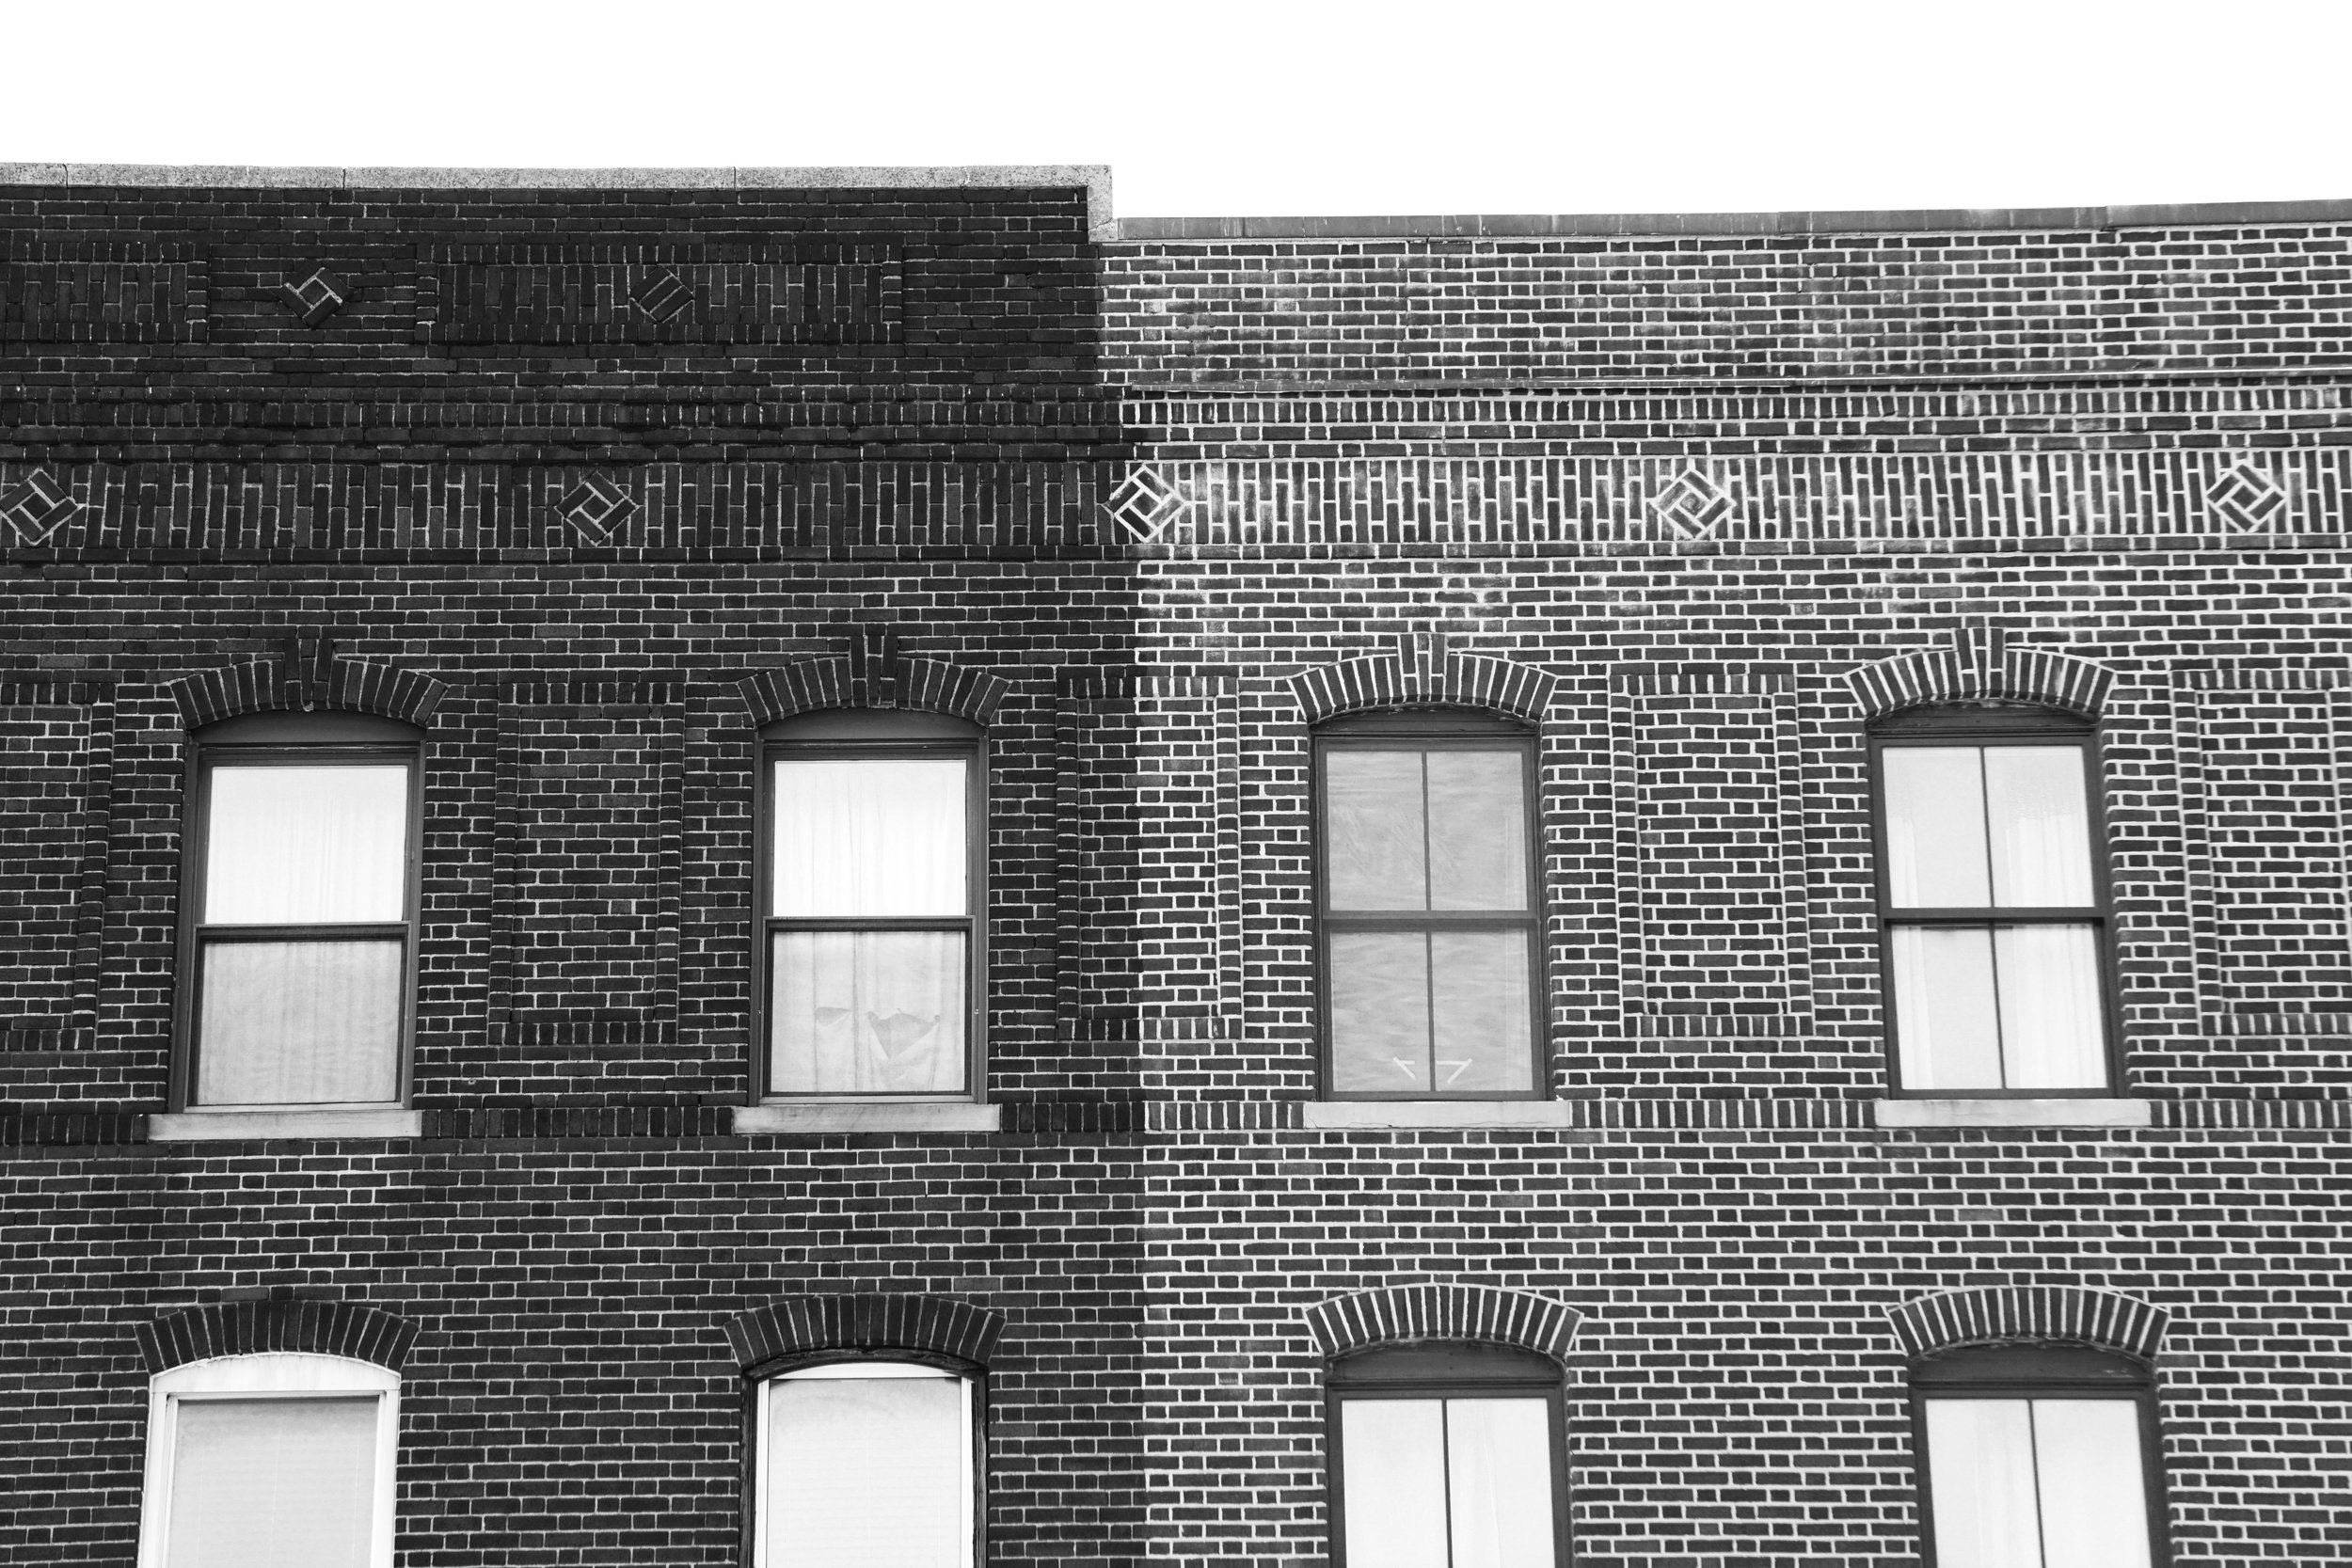 Black and White Hoboken Building